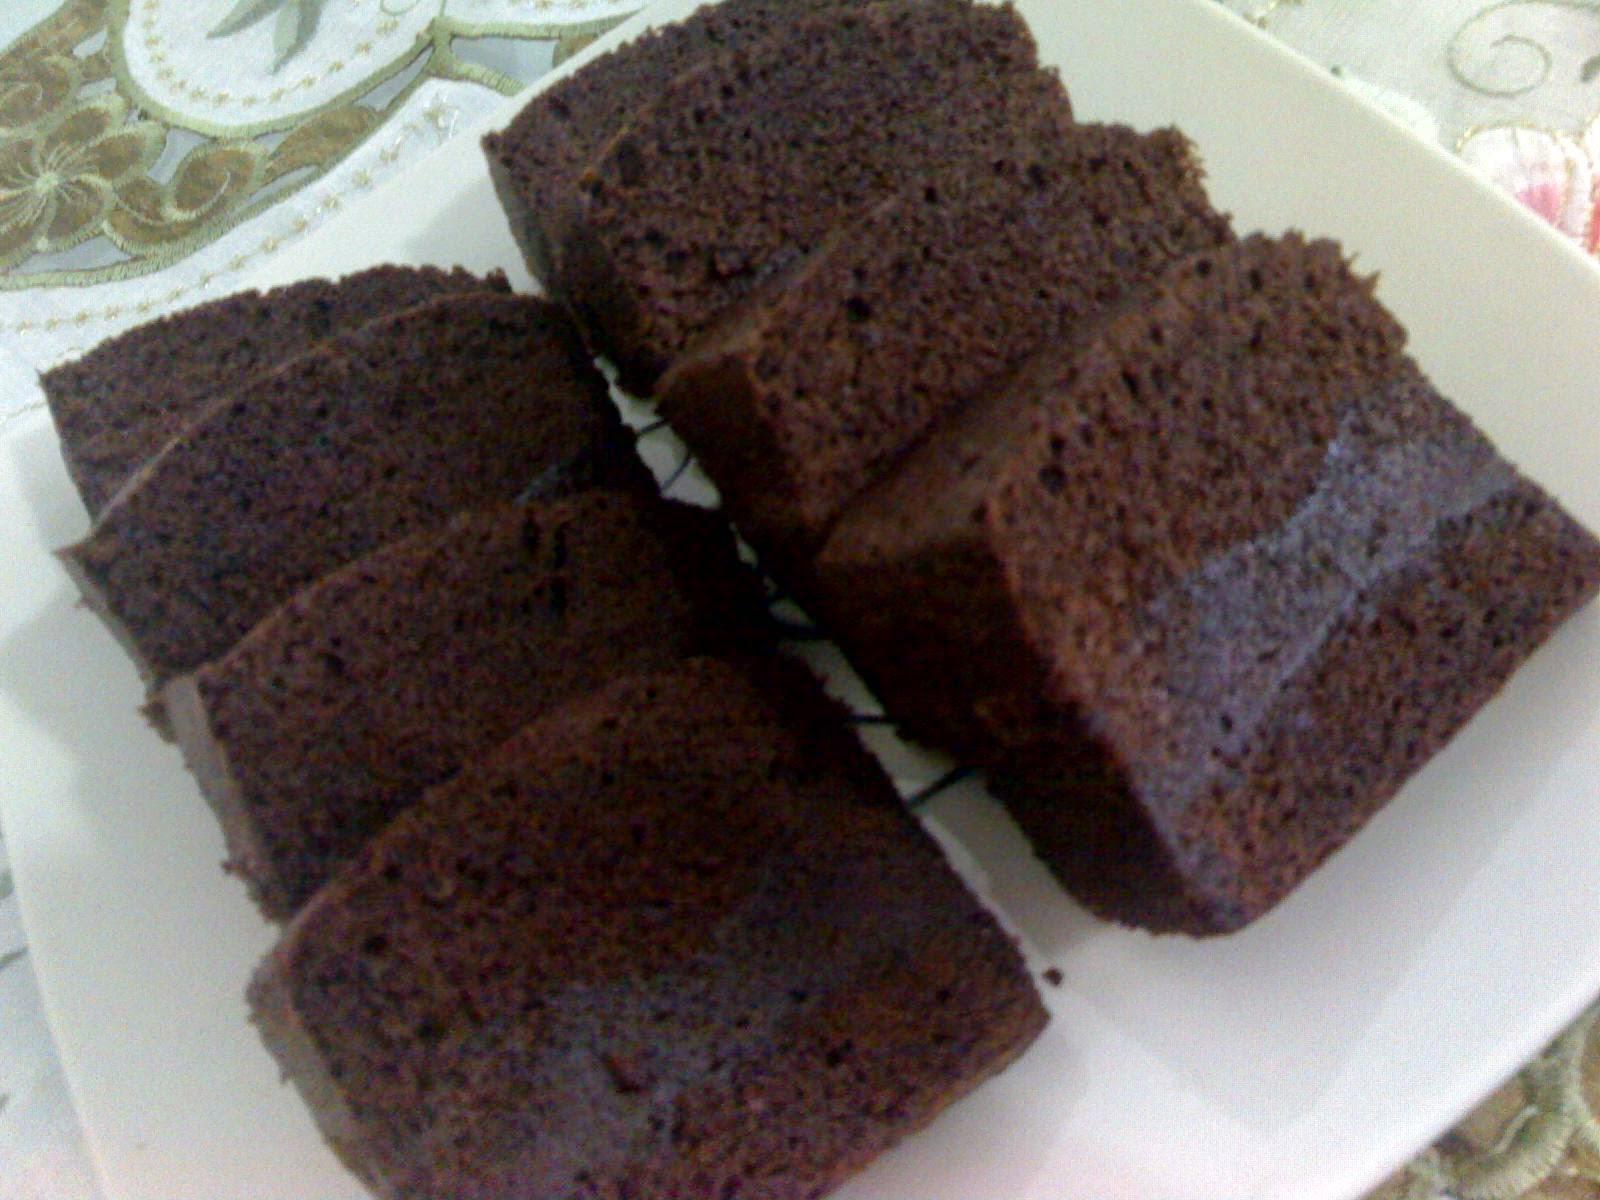 Resep Cake Kukus Gula Palem: Resep Brownies Kukus